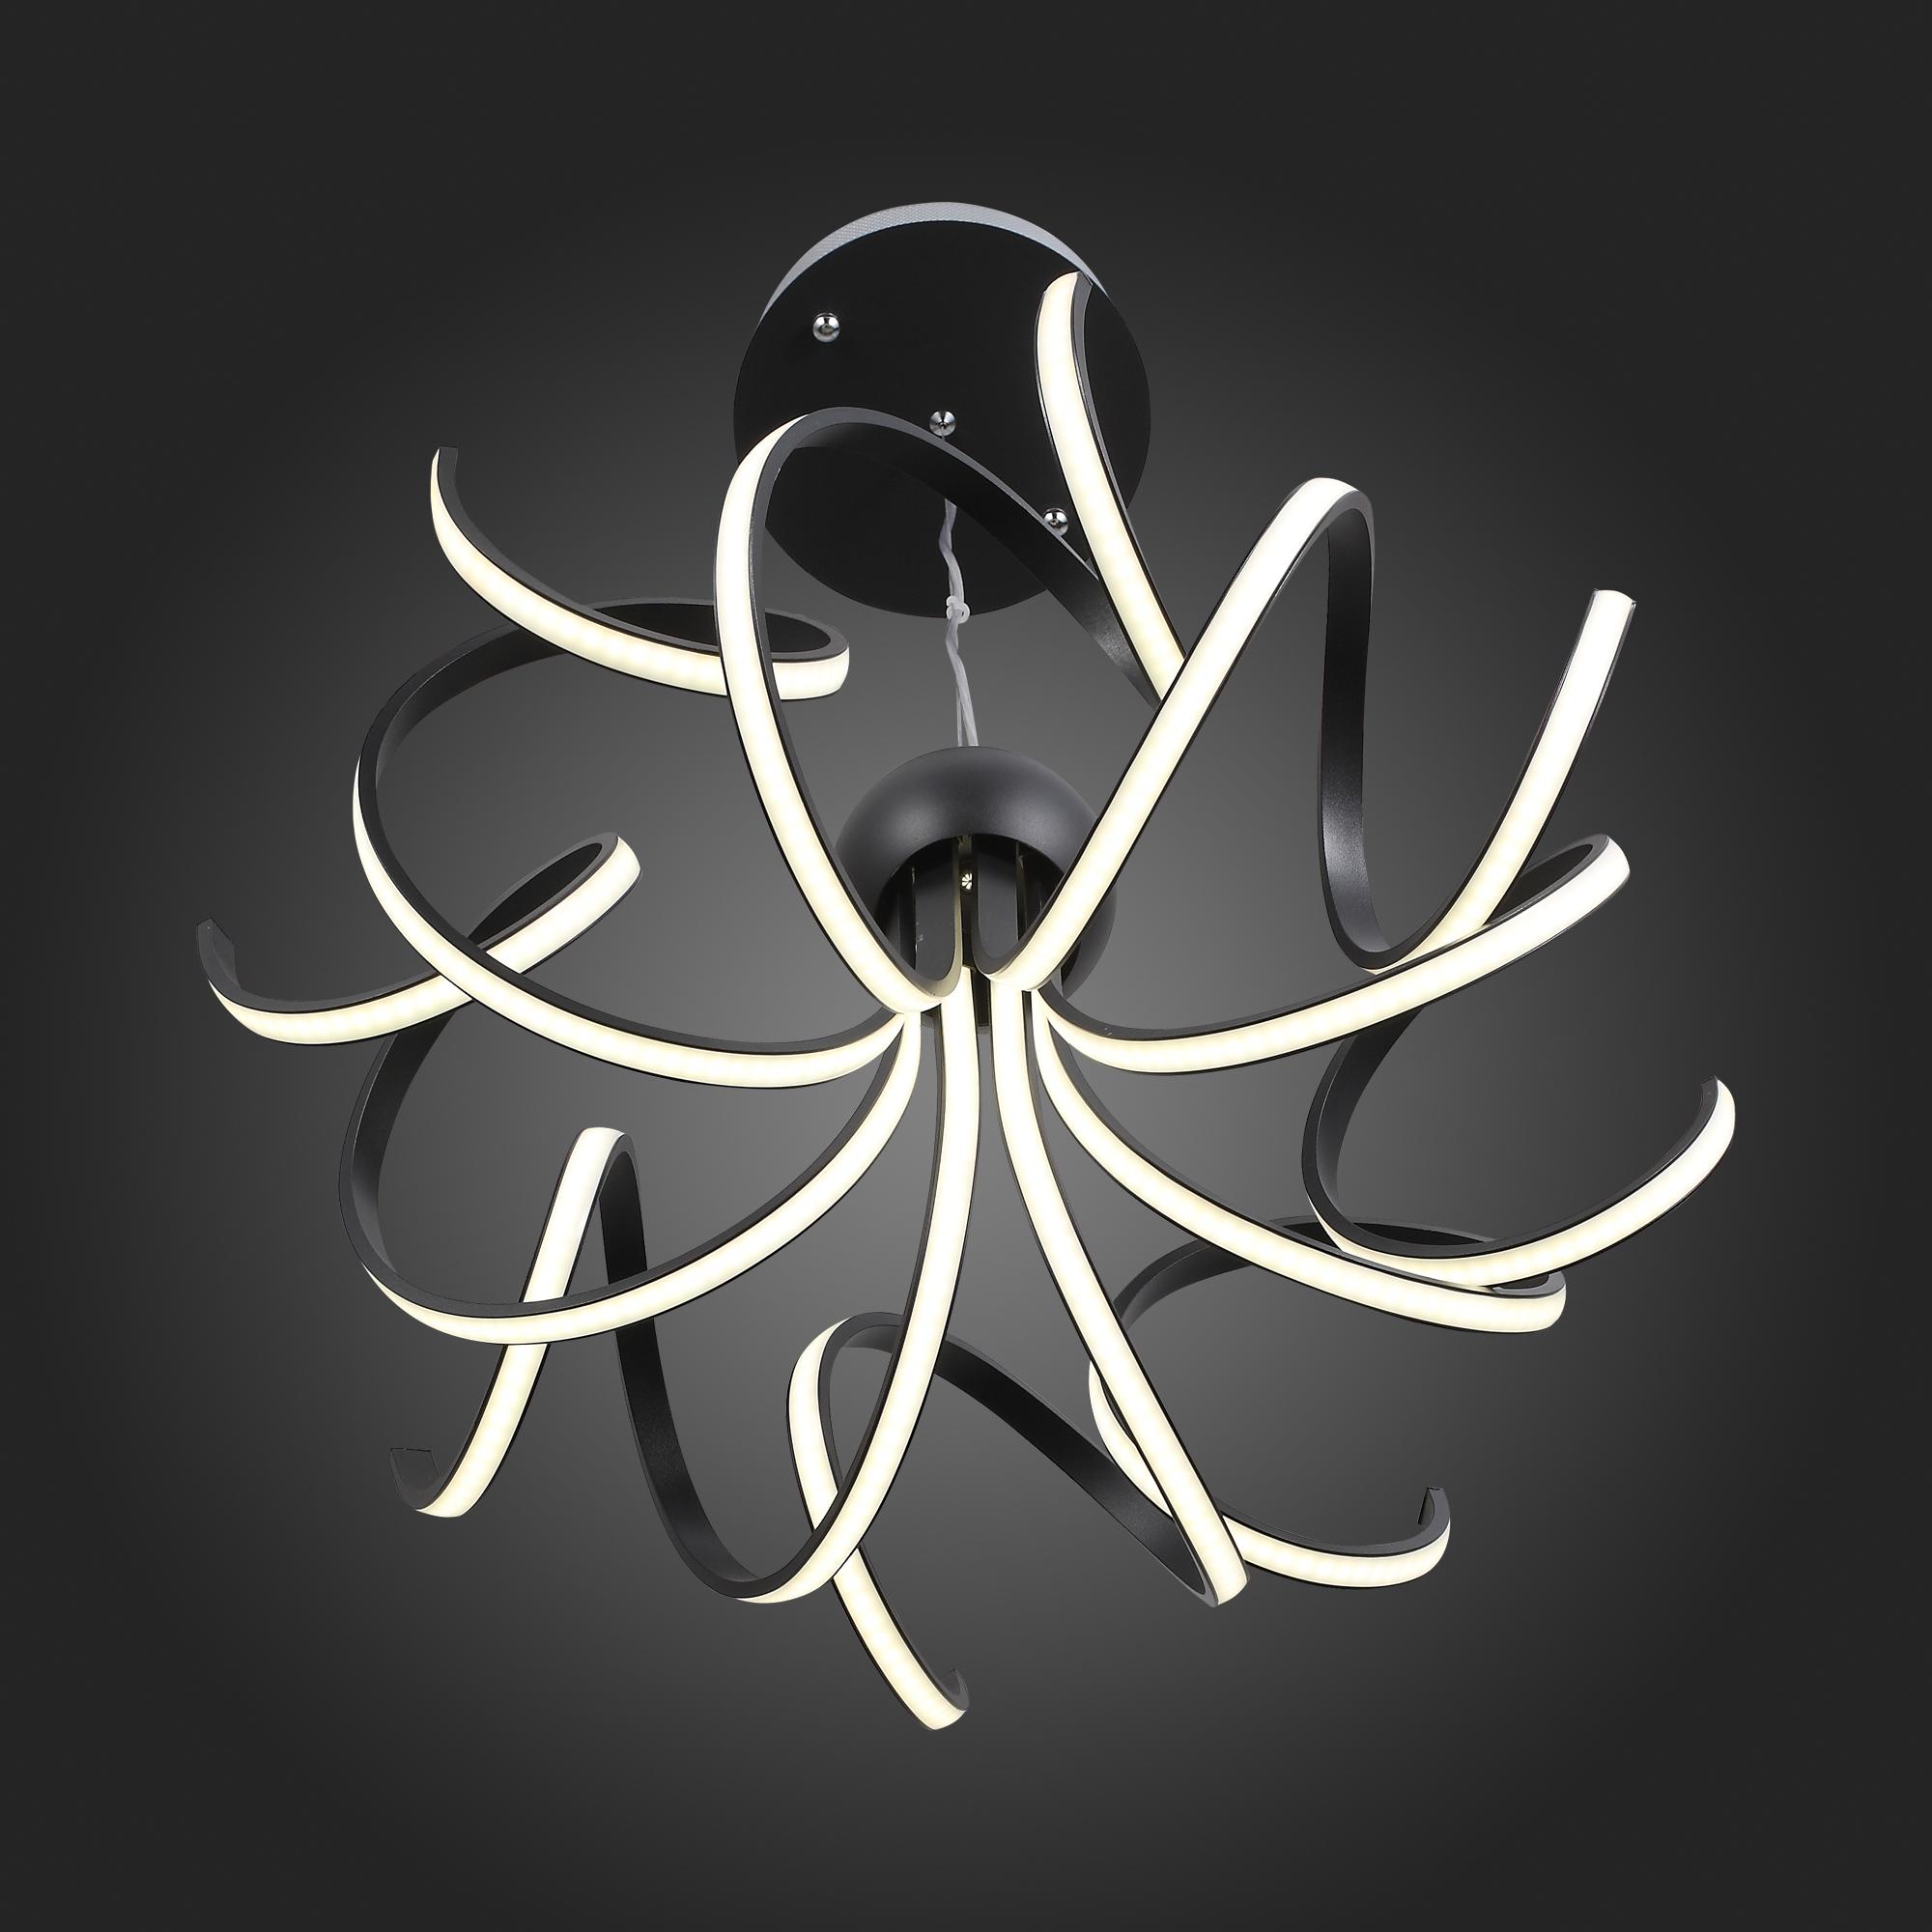 Подвесная светодиодная люстра ST Luce Fondere SL906.403.08, LED 120W 4000K (дневной) - фото 12